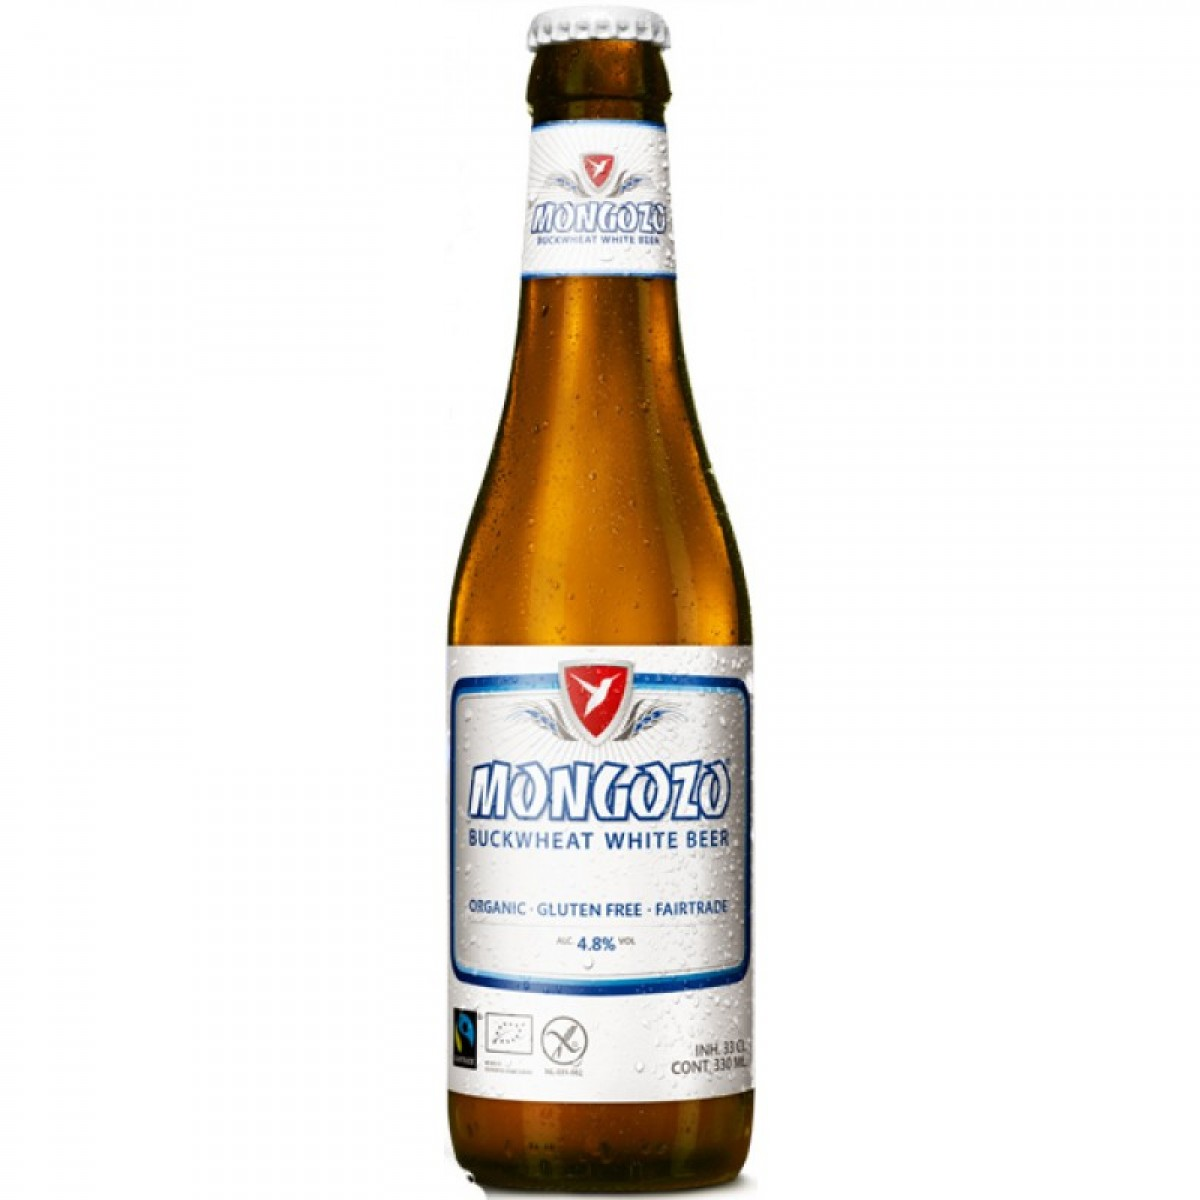 Buckwheat White Bier